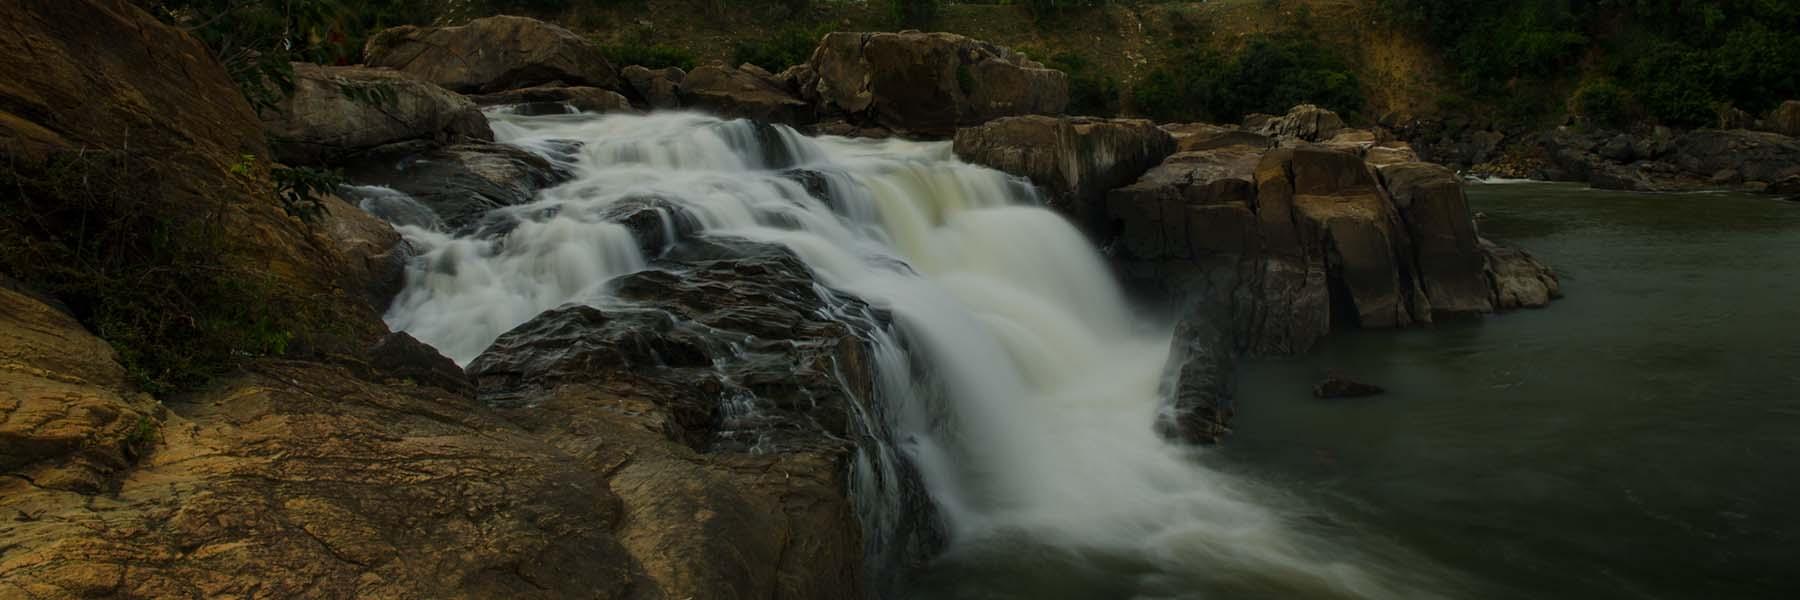 waterfalls tour by wild voyager